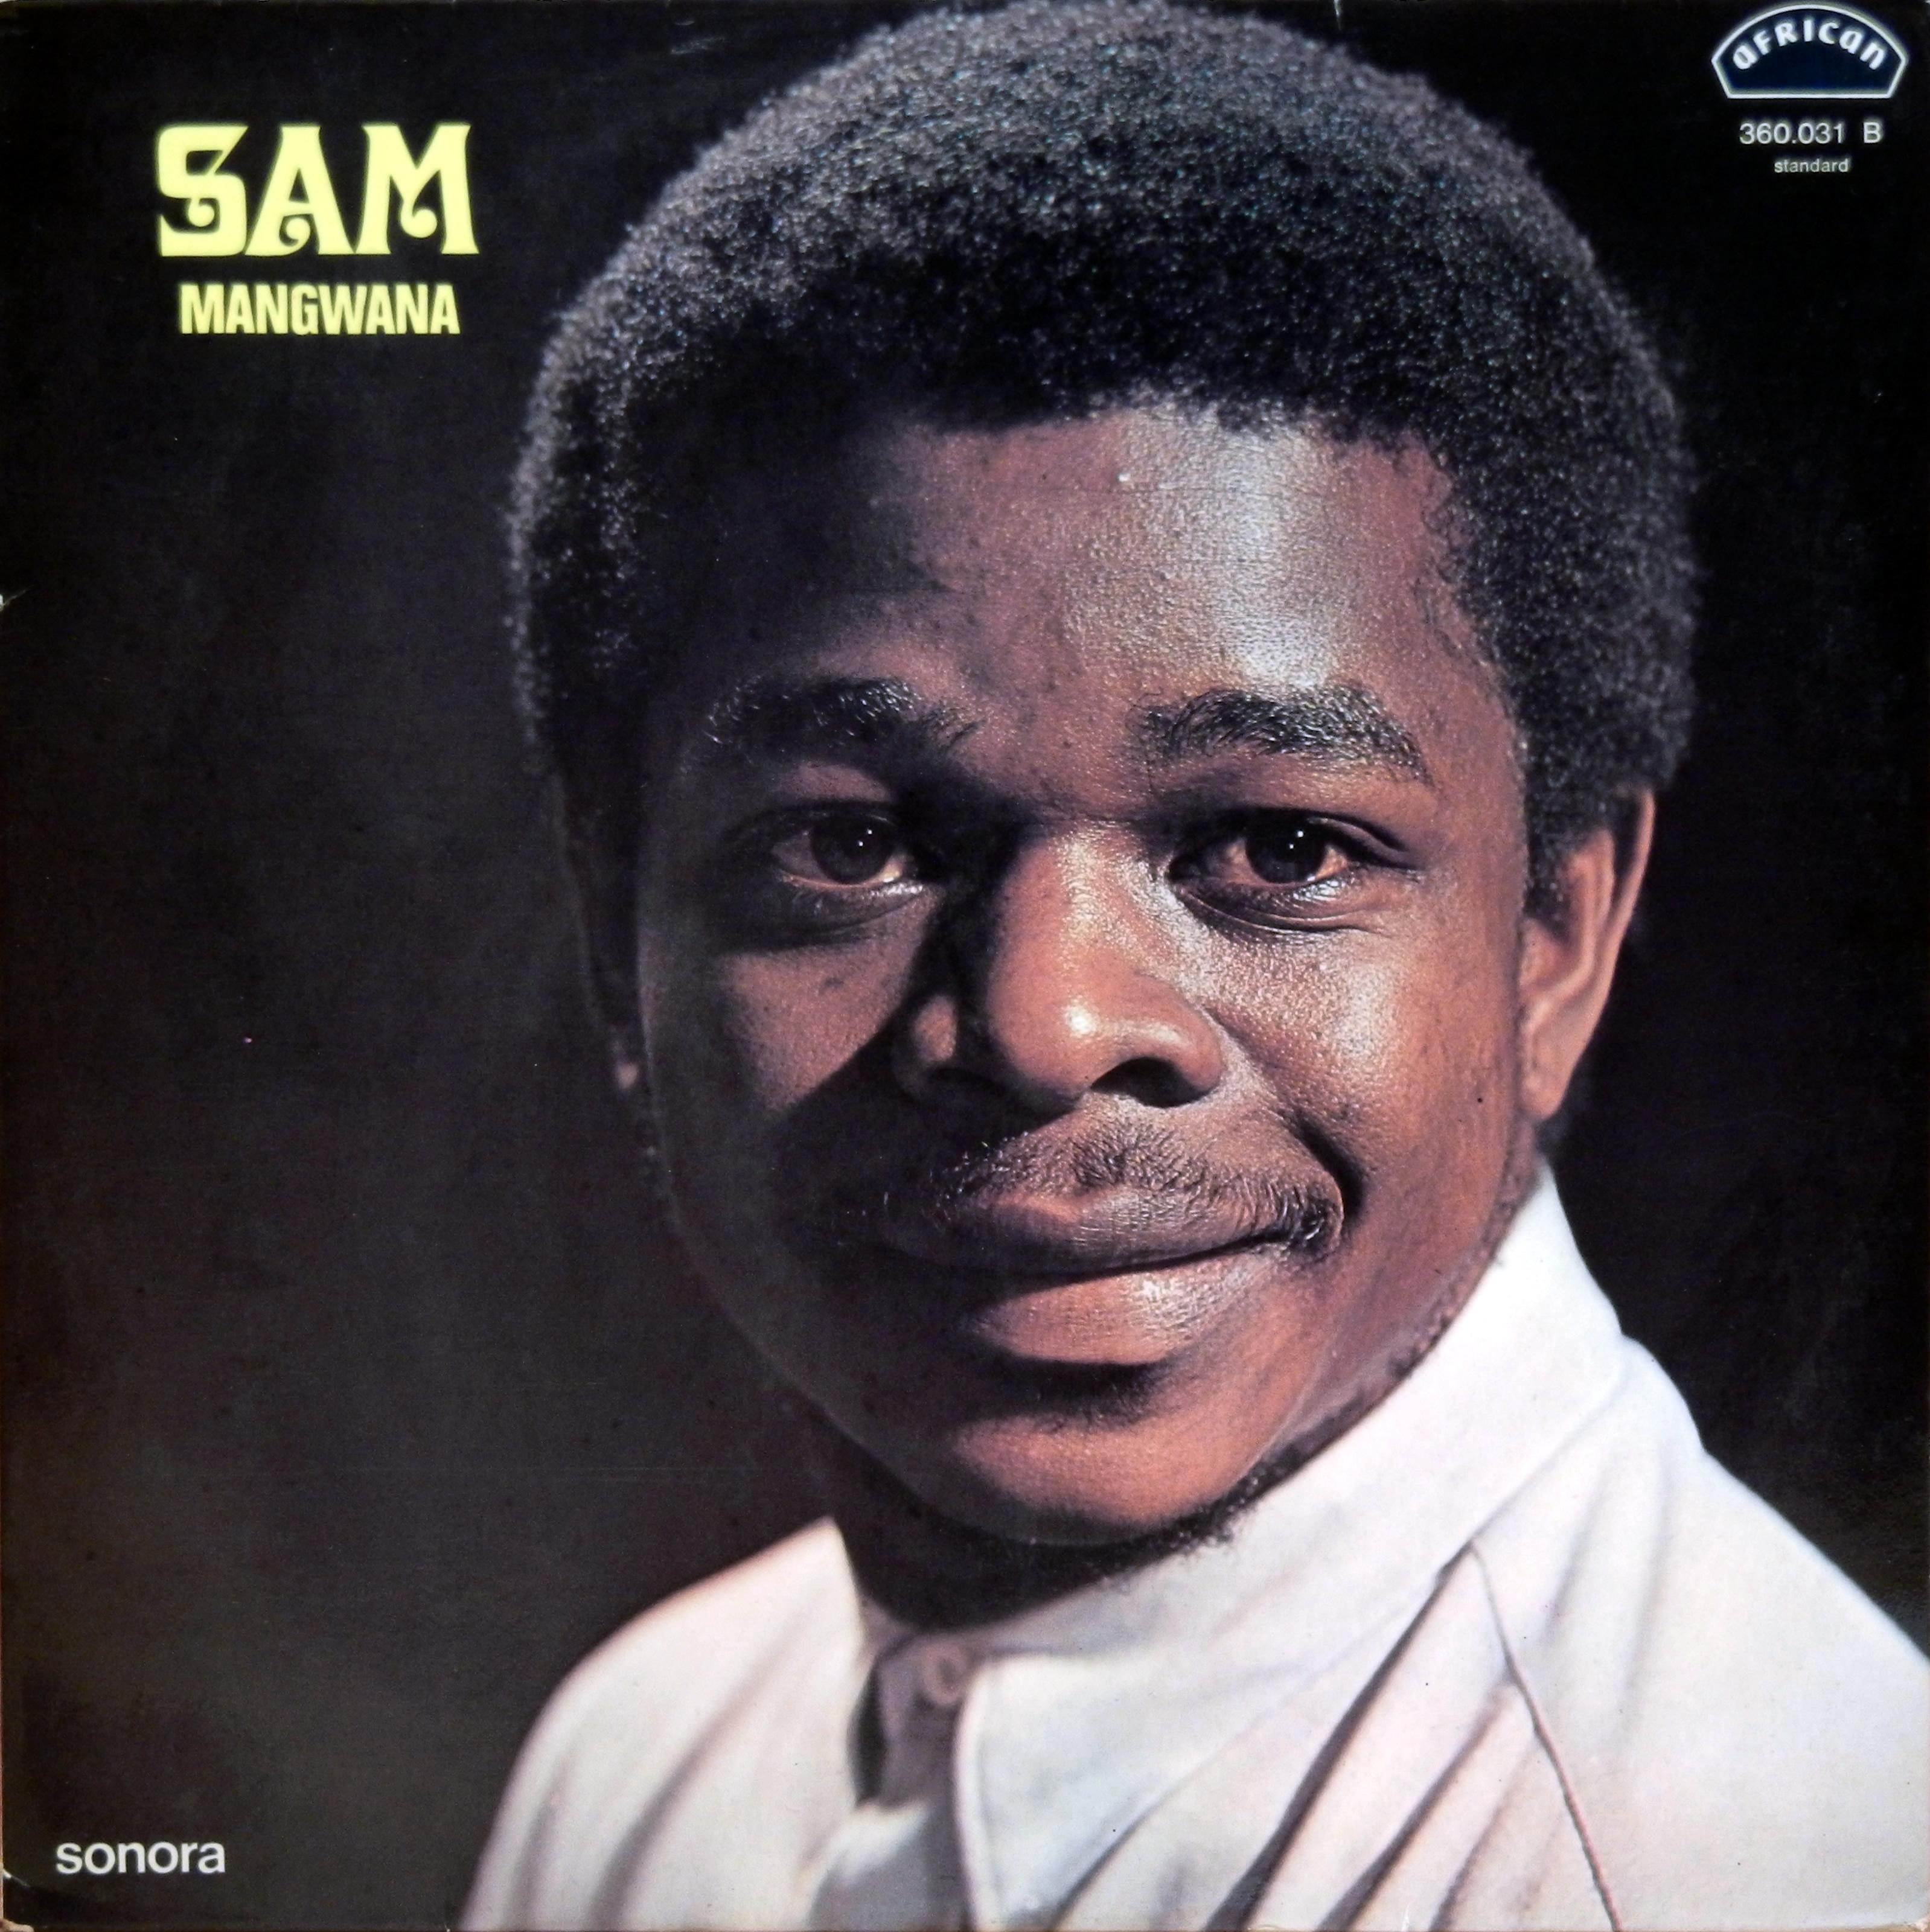 Sam Mangwana Et Le Festival Des Maquisards Le Festival Des Maquisards